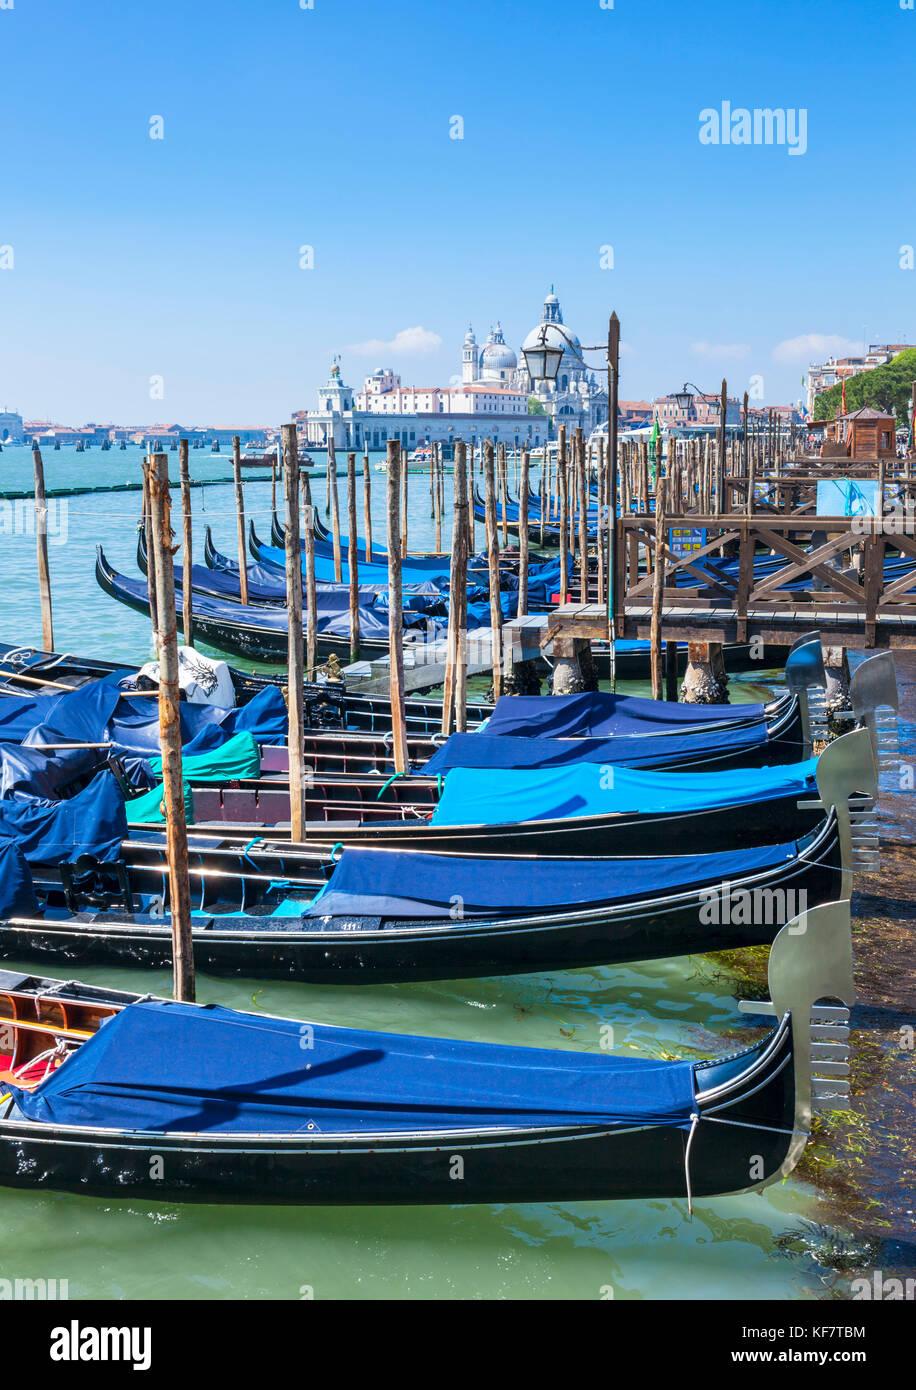 Italia Venecia Italia góndolas en el Gran Canal Venecia Riva degli Schiavoni, Venecia Italia ue europa Imagen De Stock